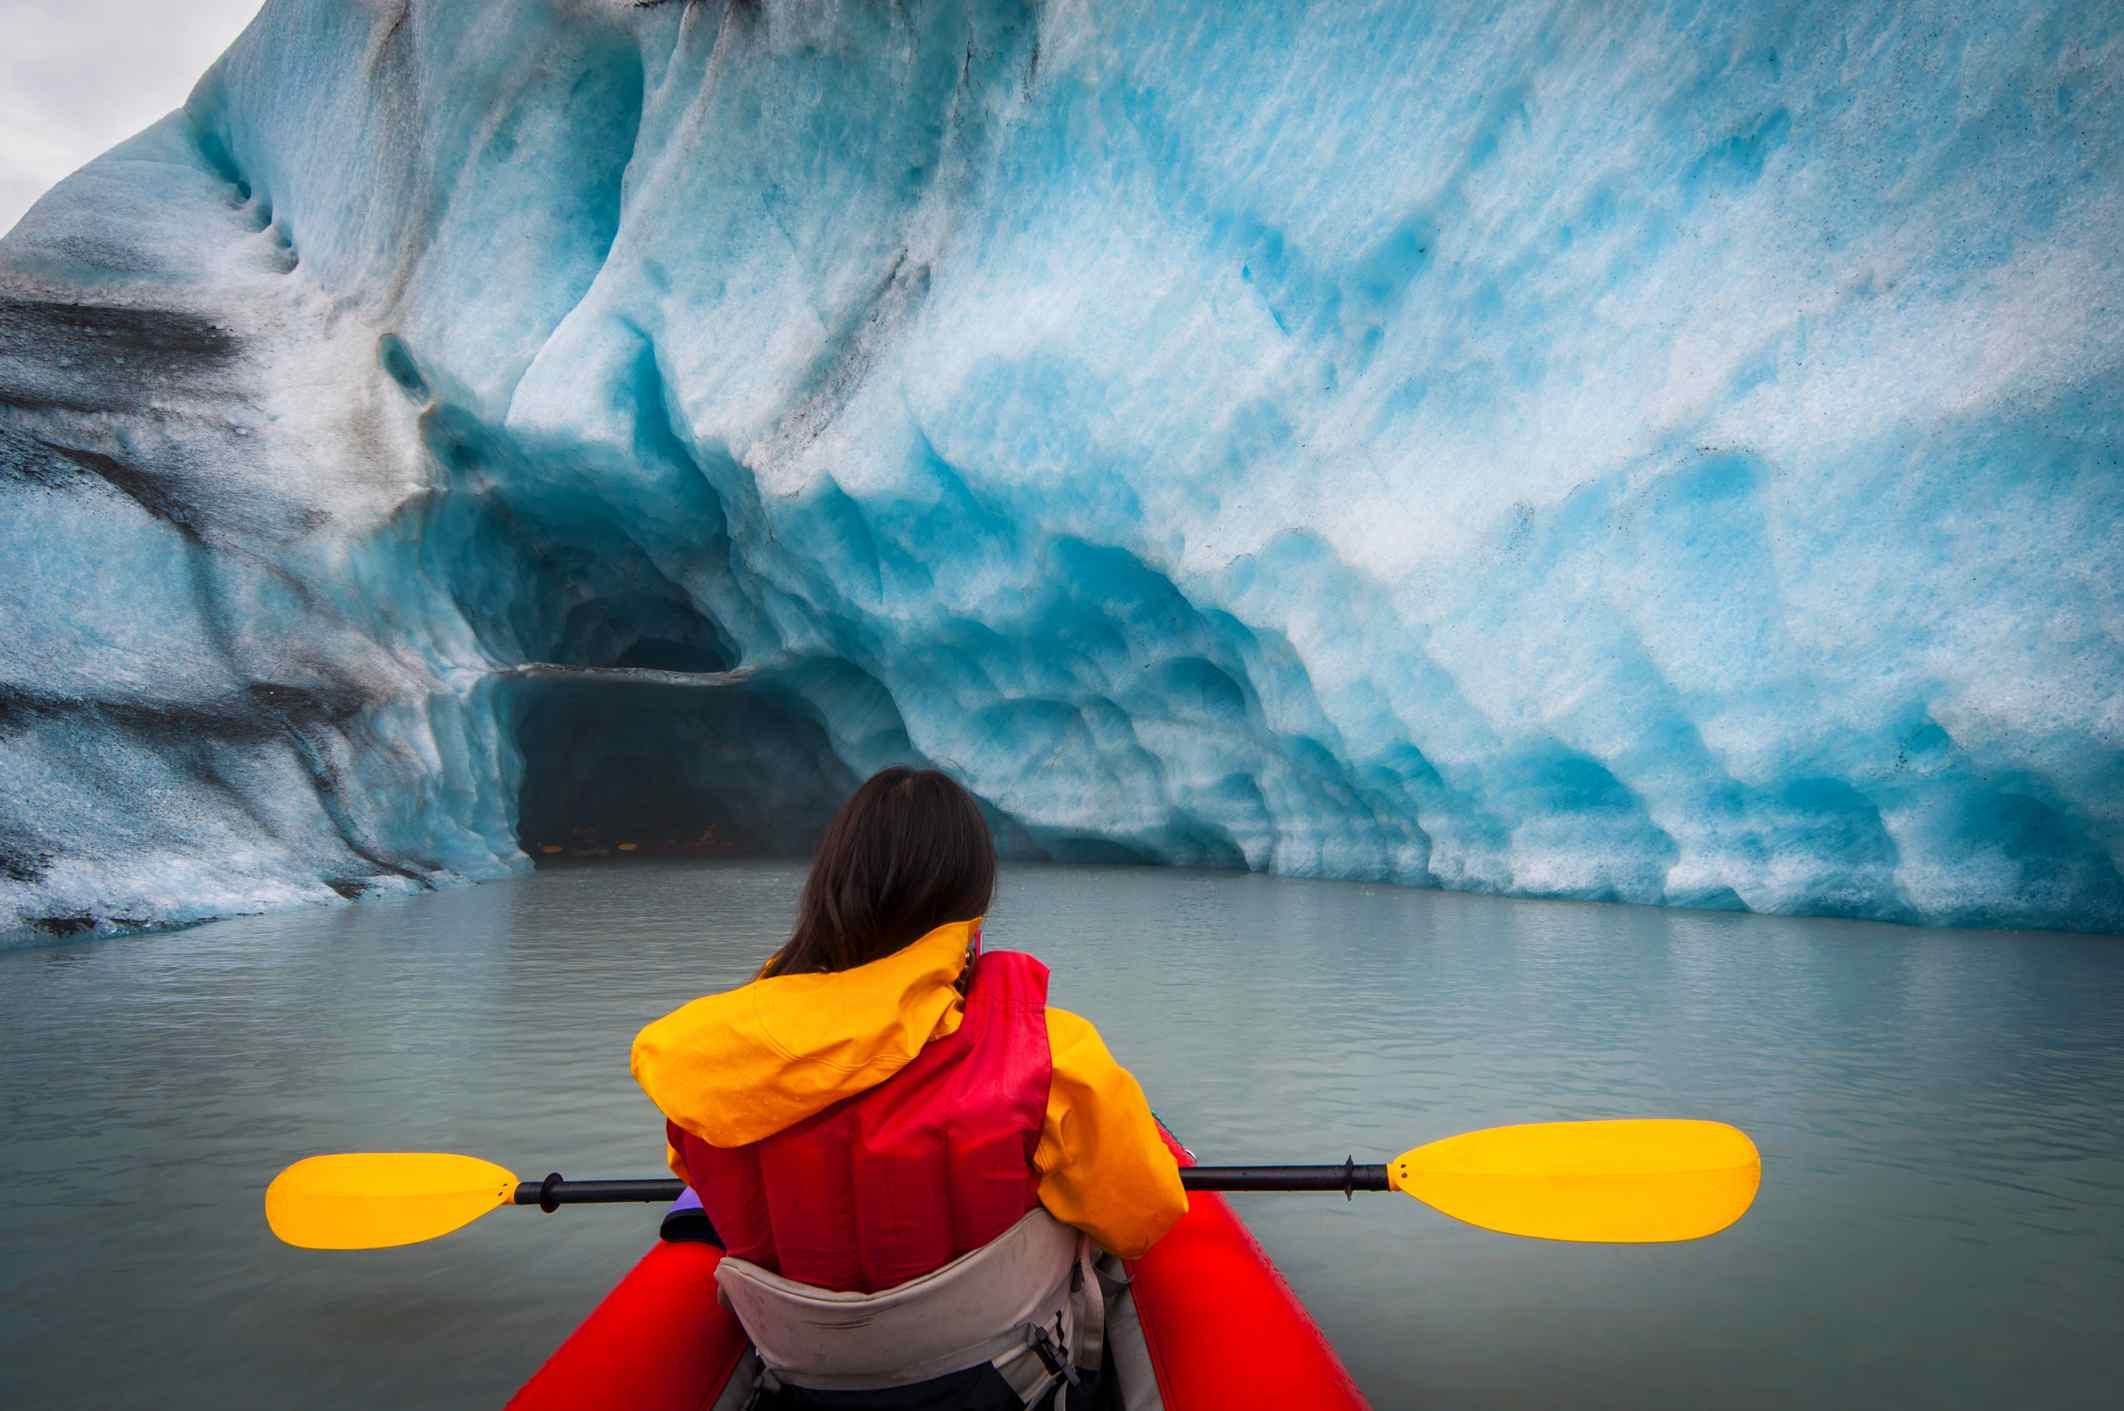 Kayaking expedition around Arctic glaciers in Alaska, United States